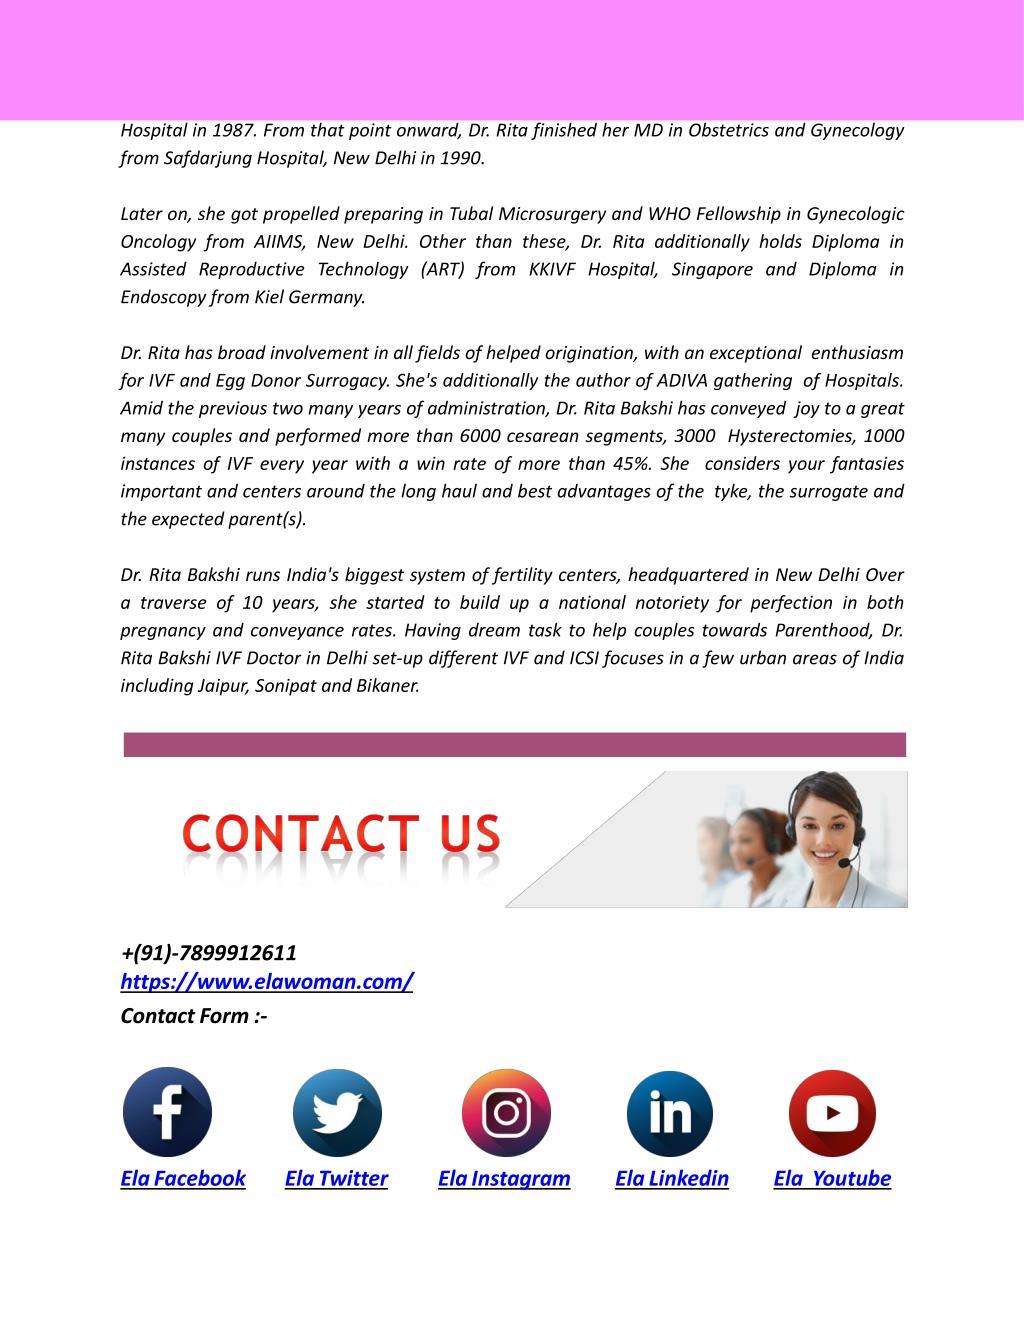 PPT - Top IVF Doctors in Delhi Ncr | Dr  Rita Bakshi | ElaWoman